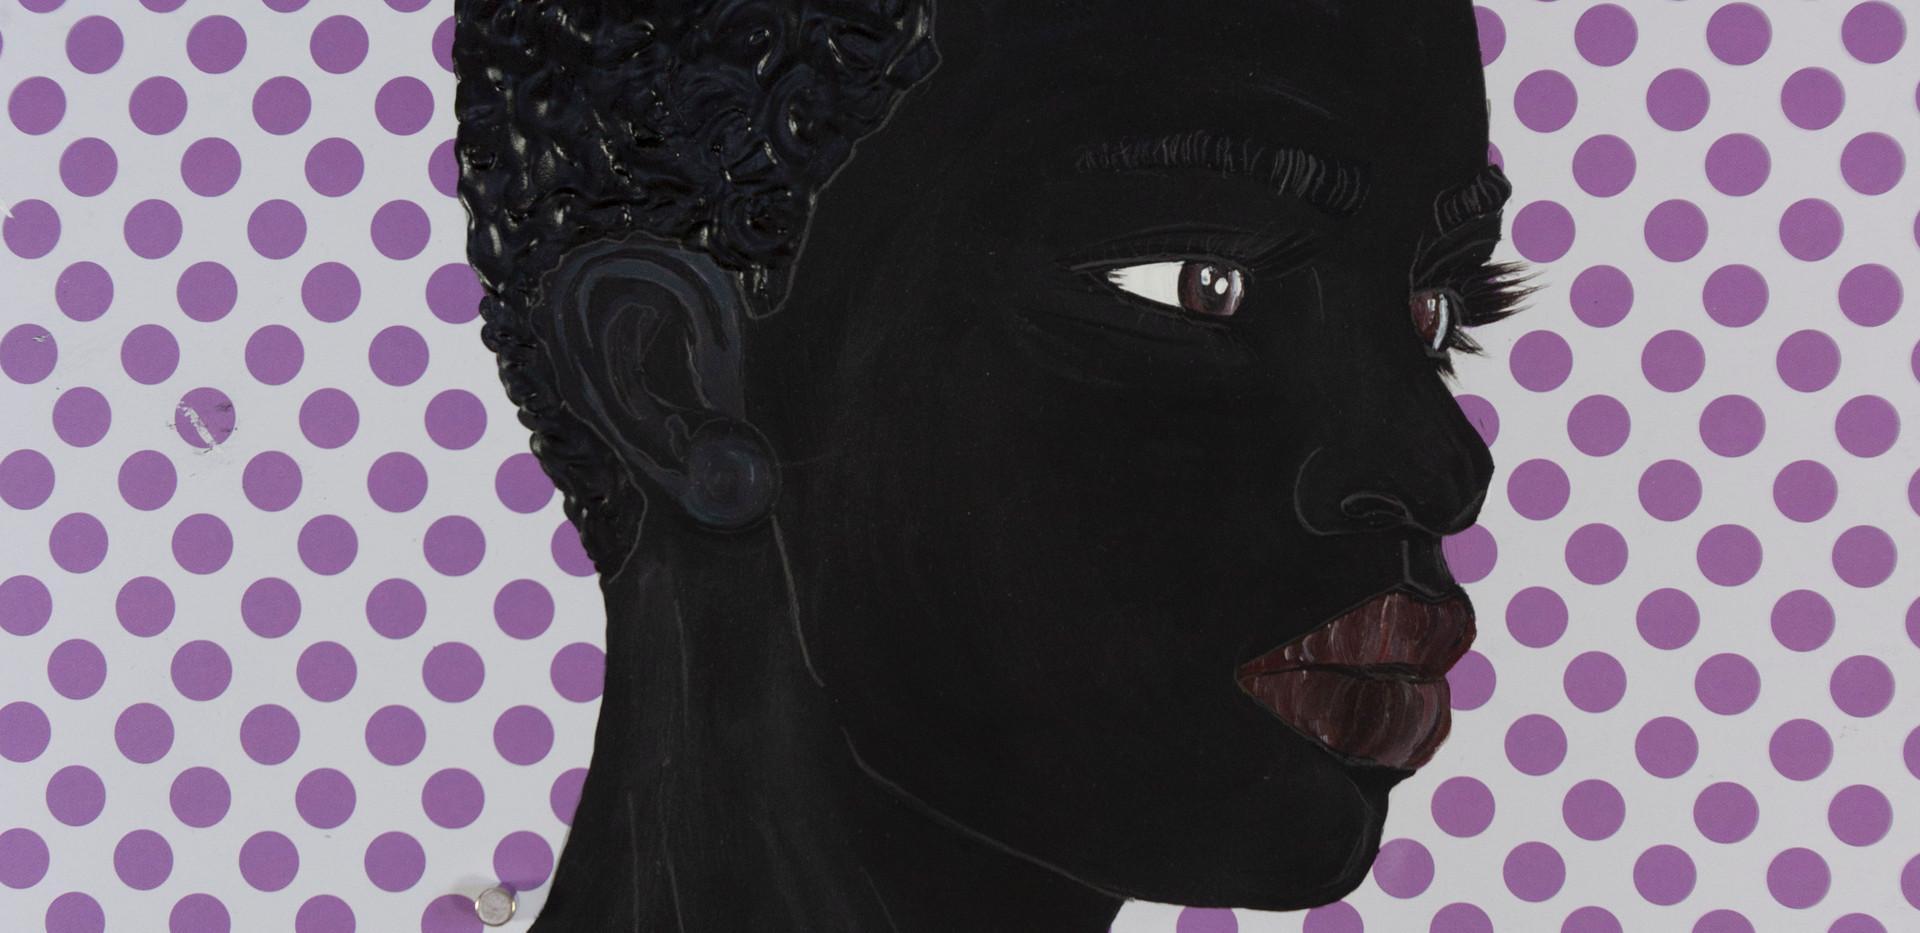 Idris Habib, Purple D, Acrylic and pencil on paper, 2020, 12 x 12 in